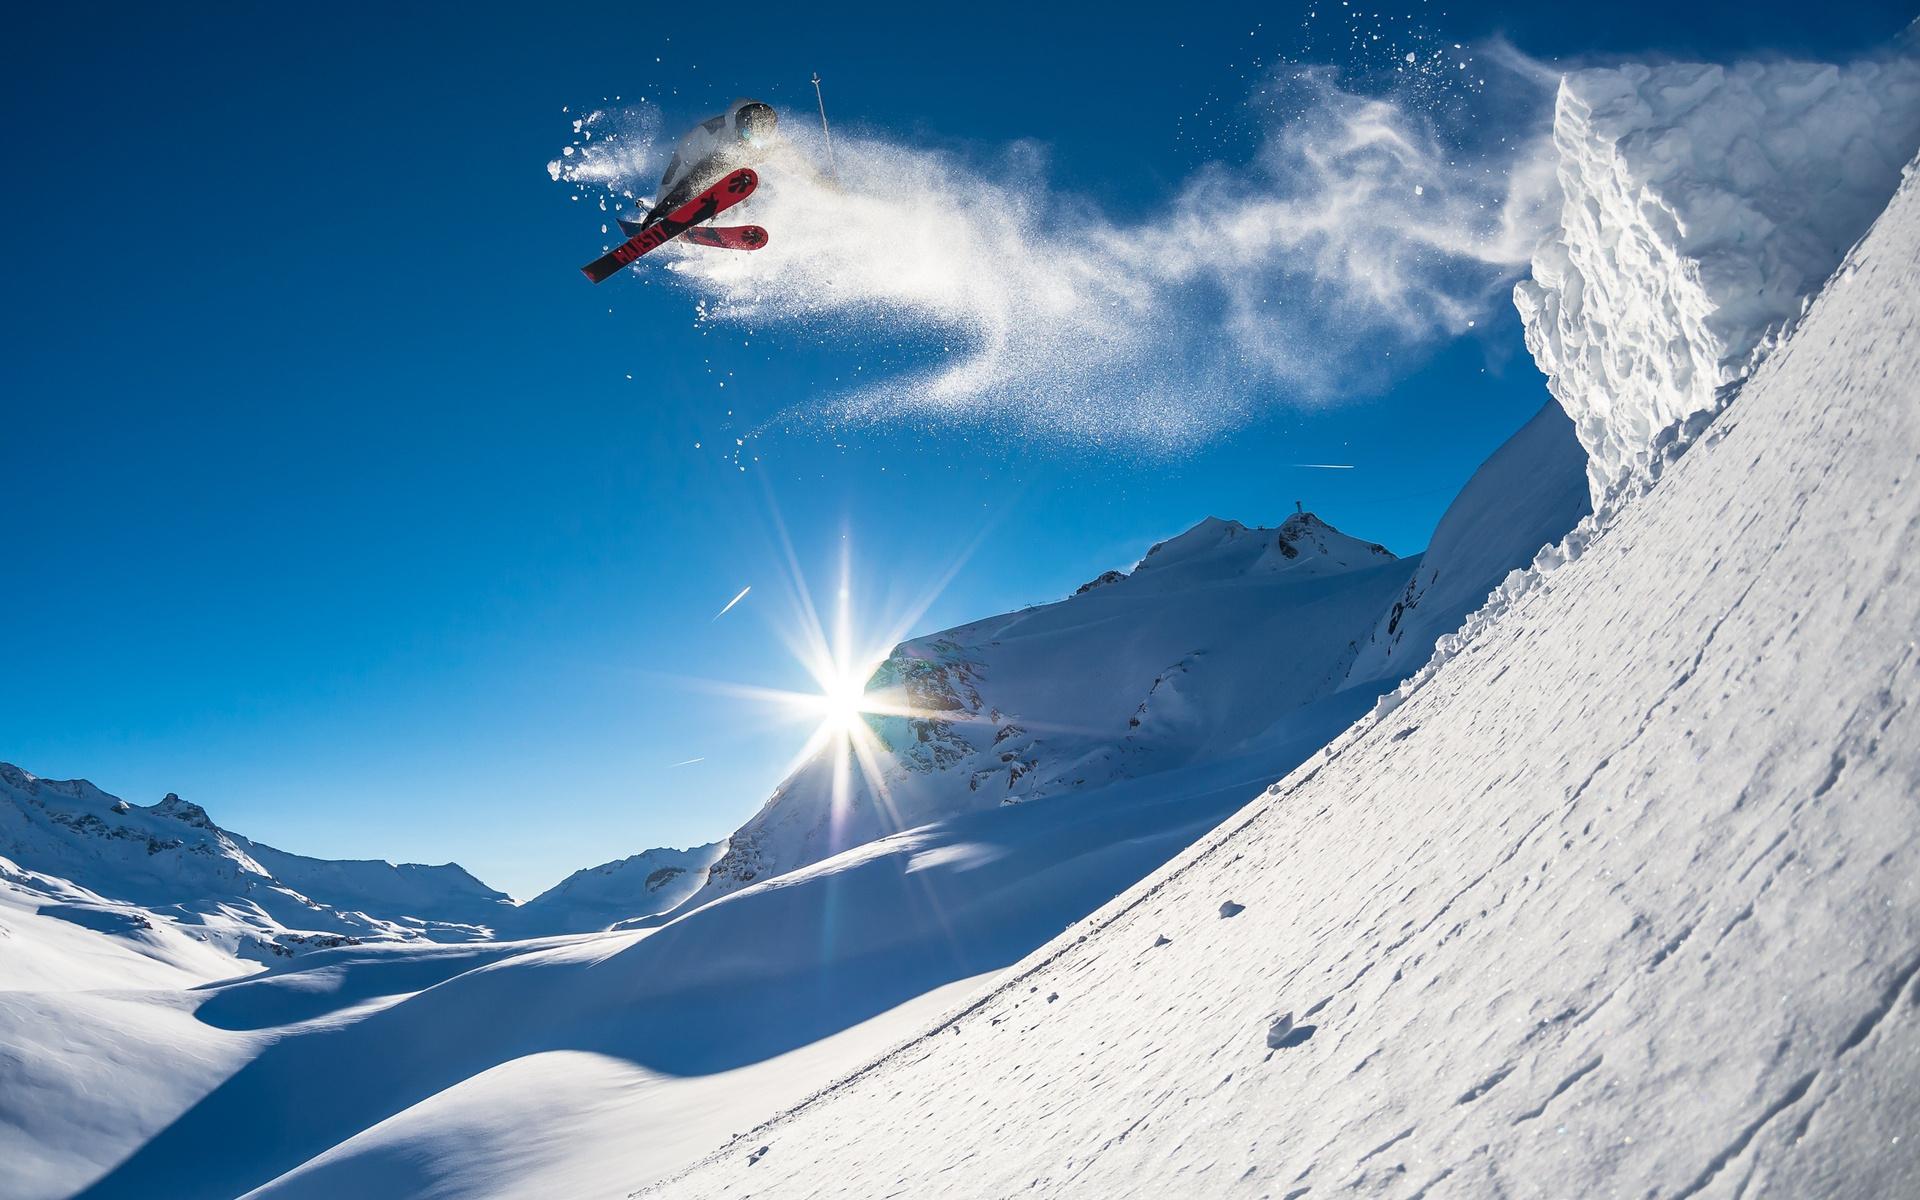 Ski Jumping Hd Desktop Wallpaper 23954 Baltana   Ski Wallpapers Hd 1920x1200